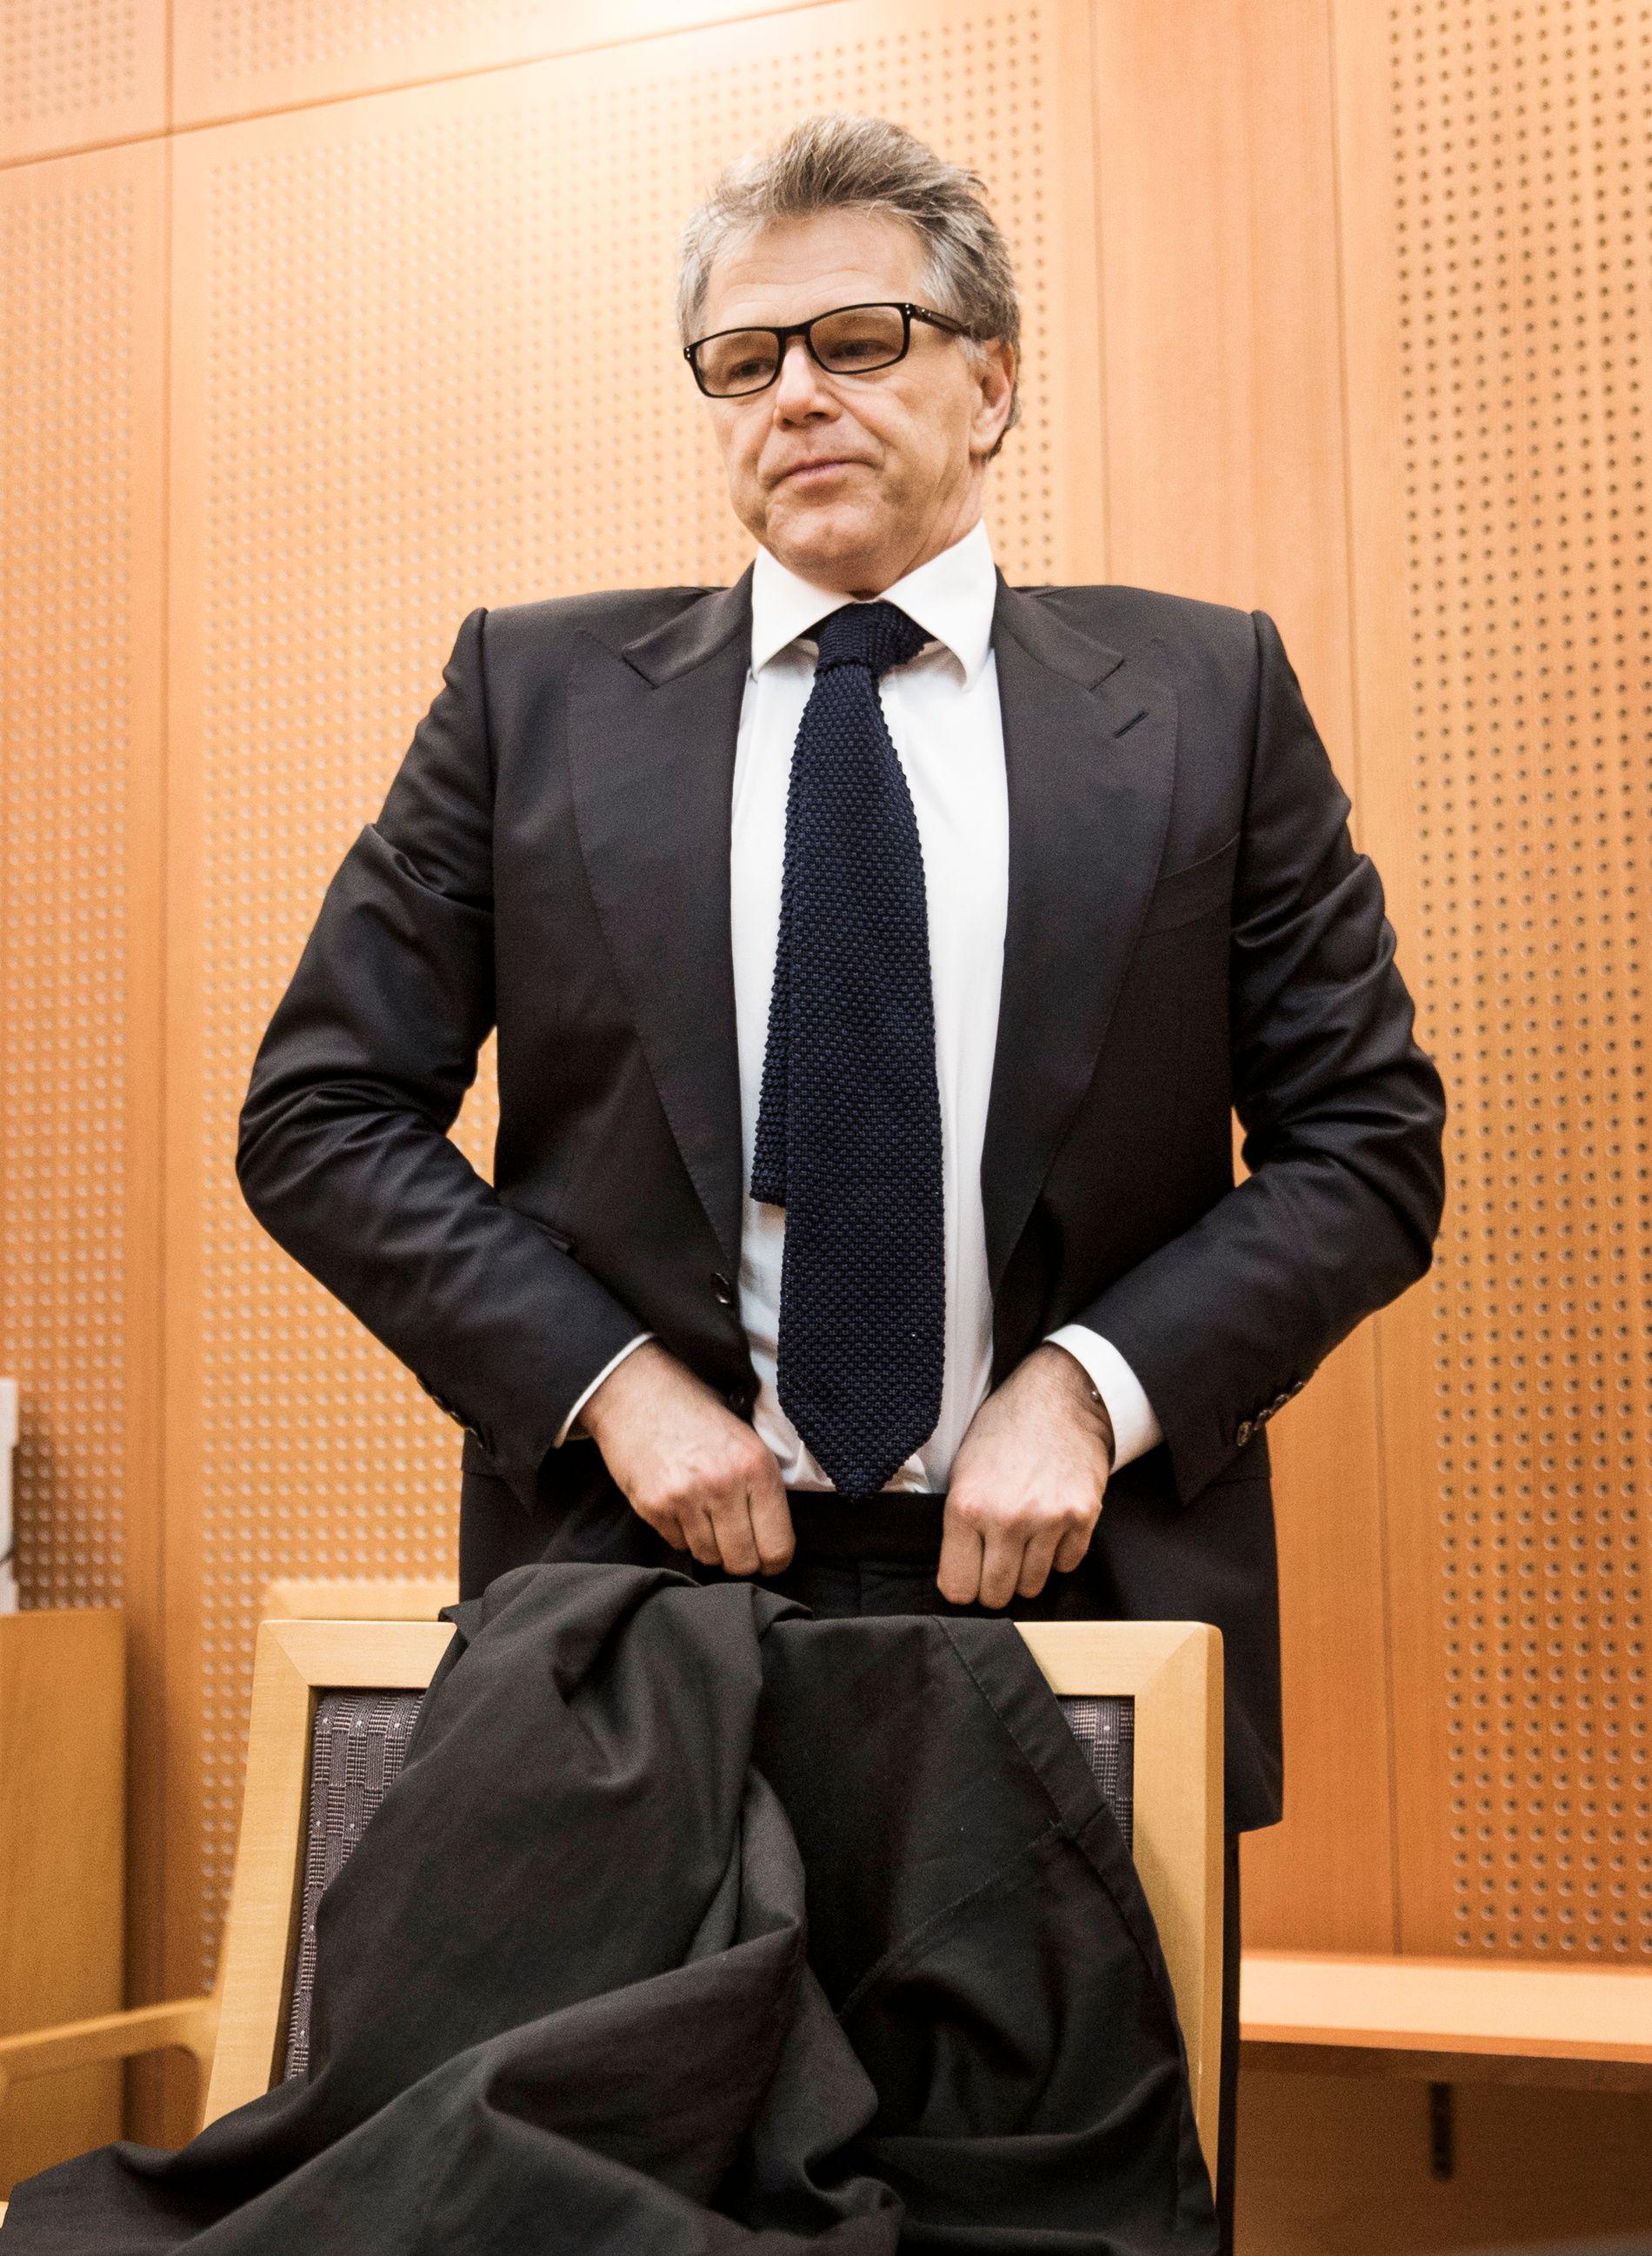 FORSVARER: Advokat Øystein Storrvik.